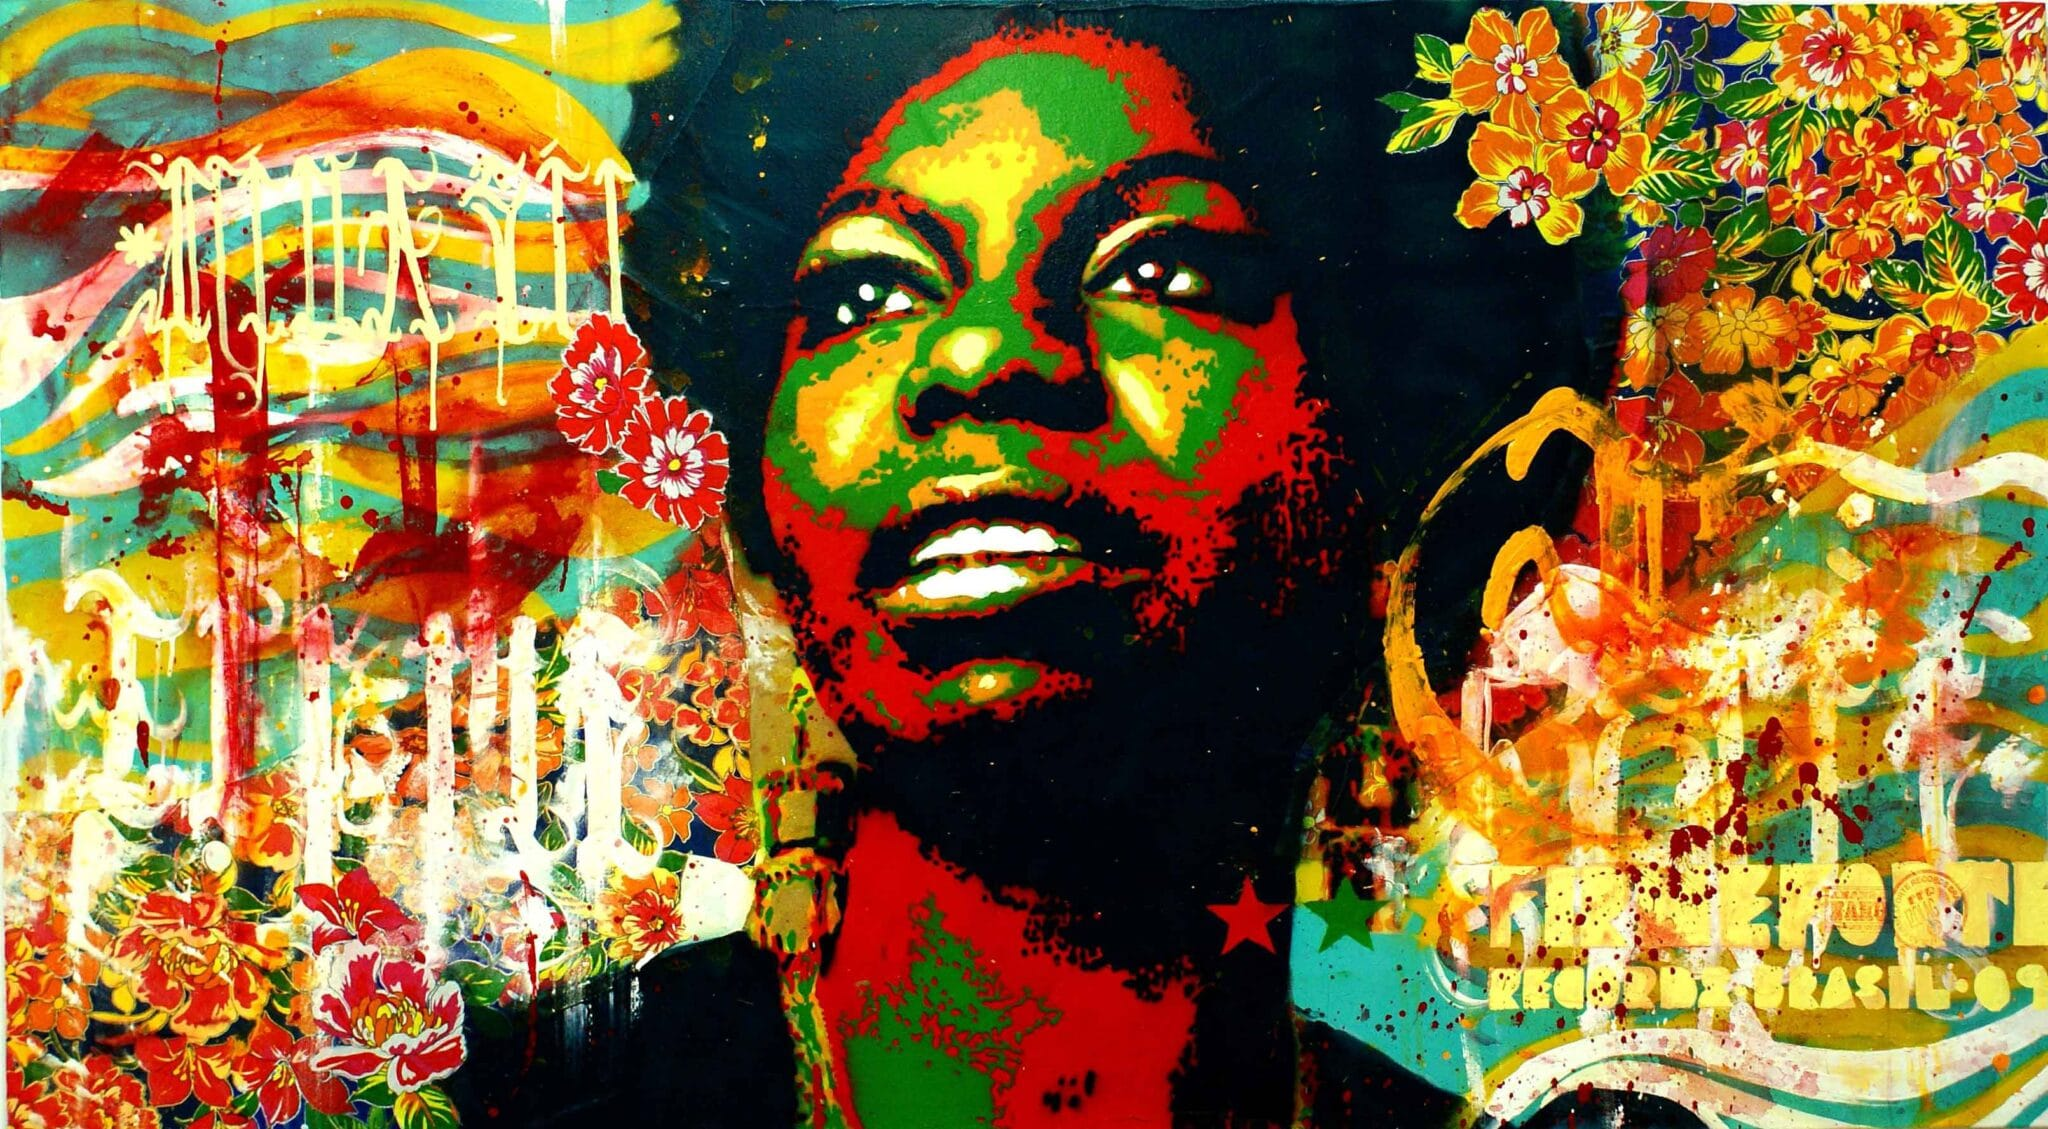 Minnesota, goddam! Nina Simone e la rivolta armata.